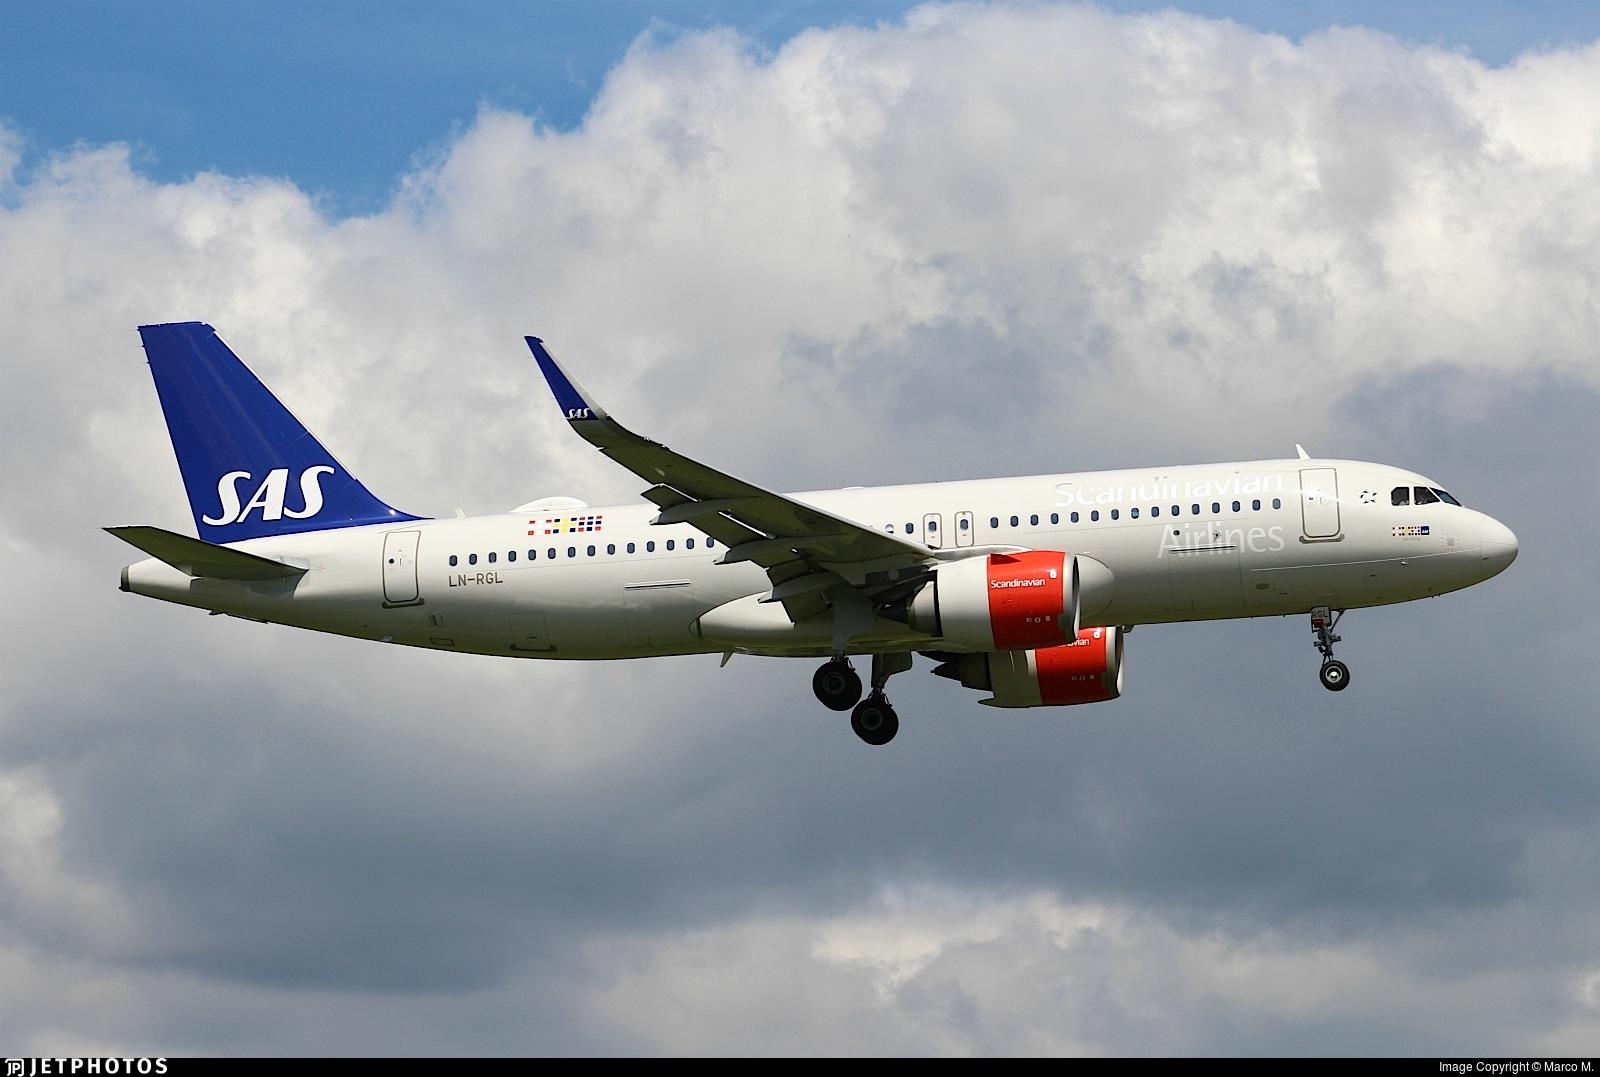 Рейкьявик (KEF) - Копенгаген (CPH) на Airbus A320neo авиакомпании SAS Scandinavian Airlines (114 фото) + Бонус